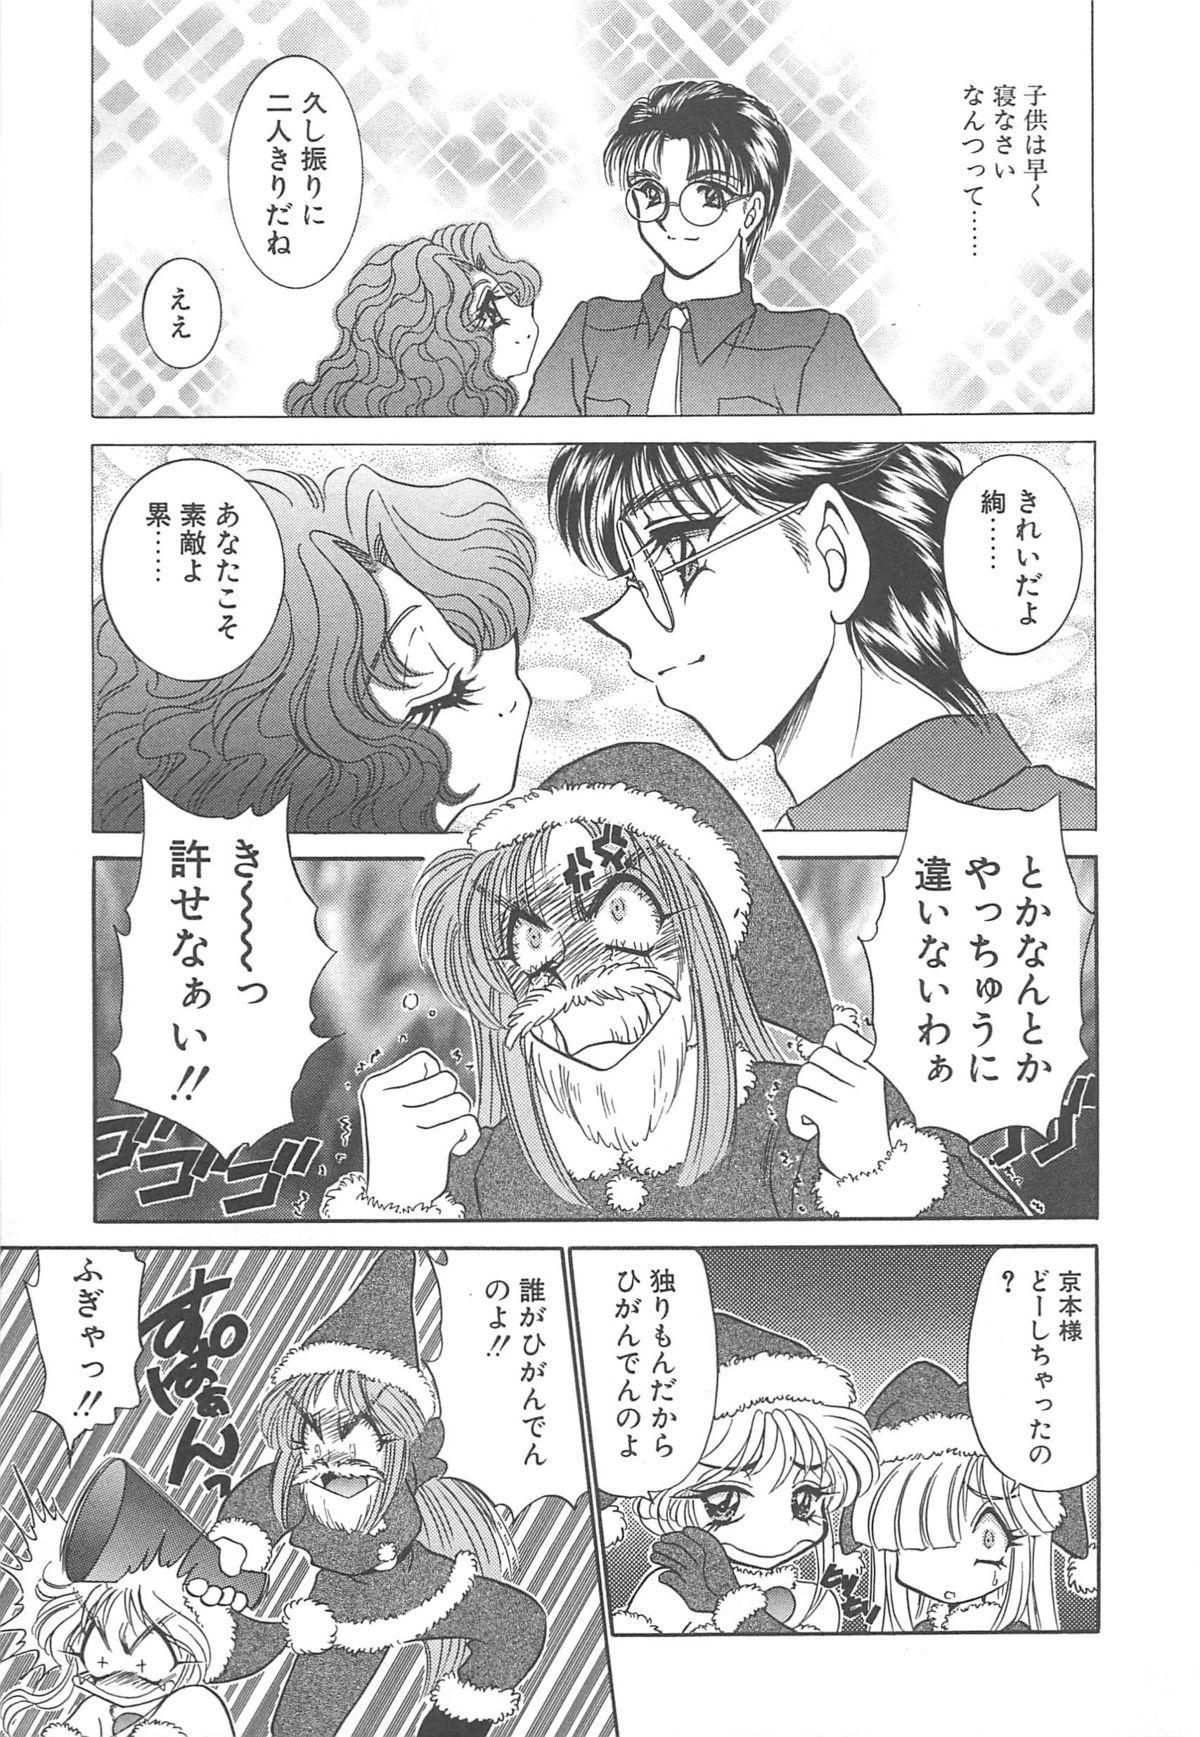 Kigurumi Sentai Quiltian 93